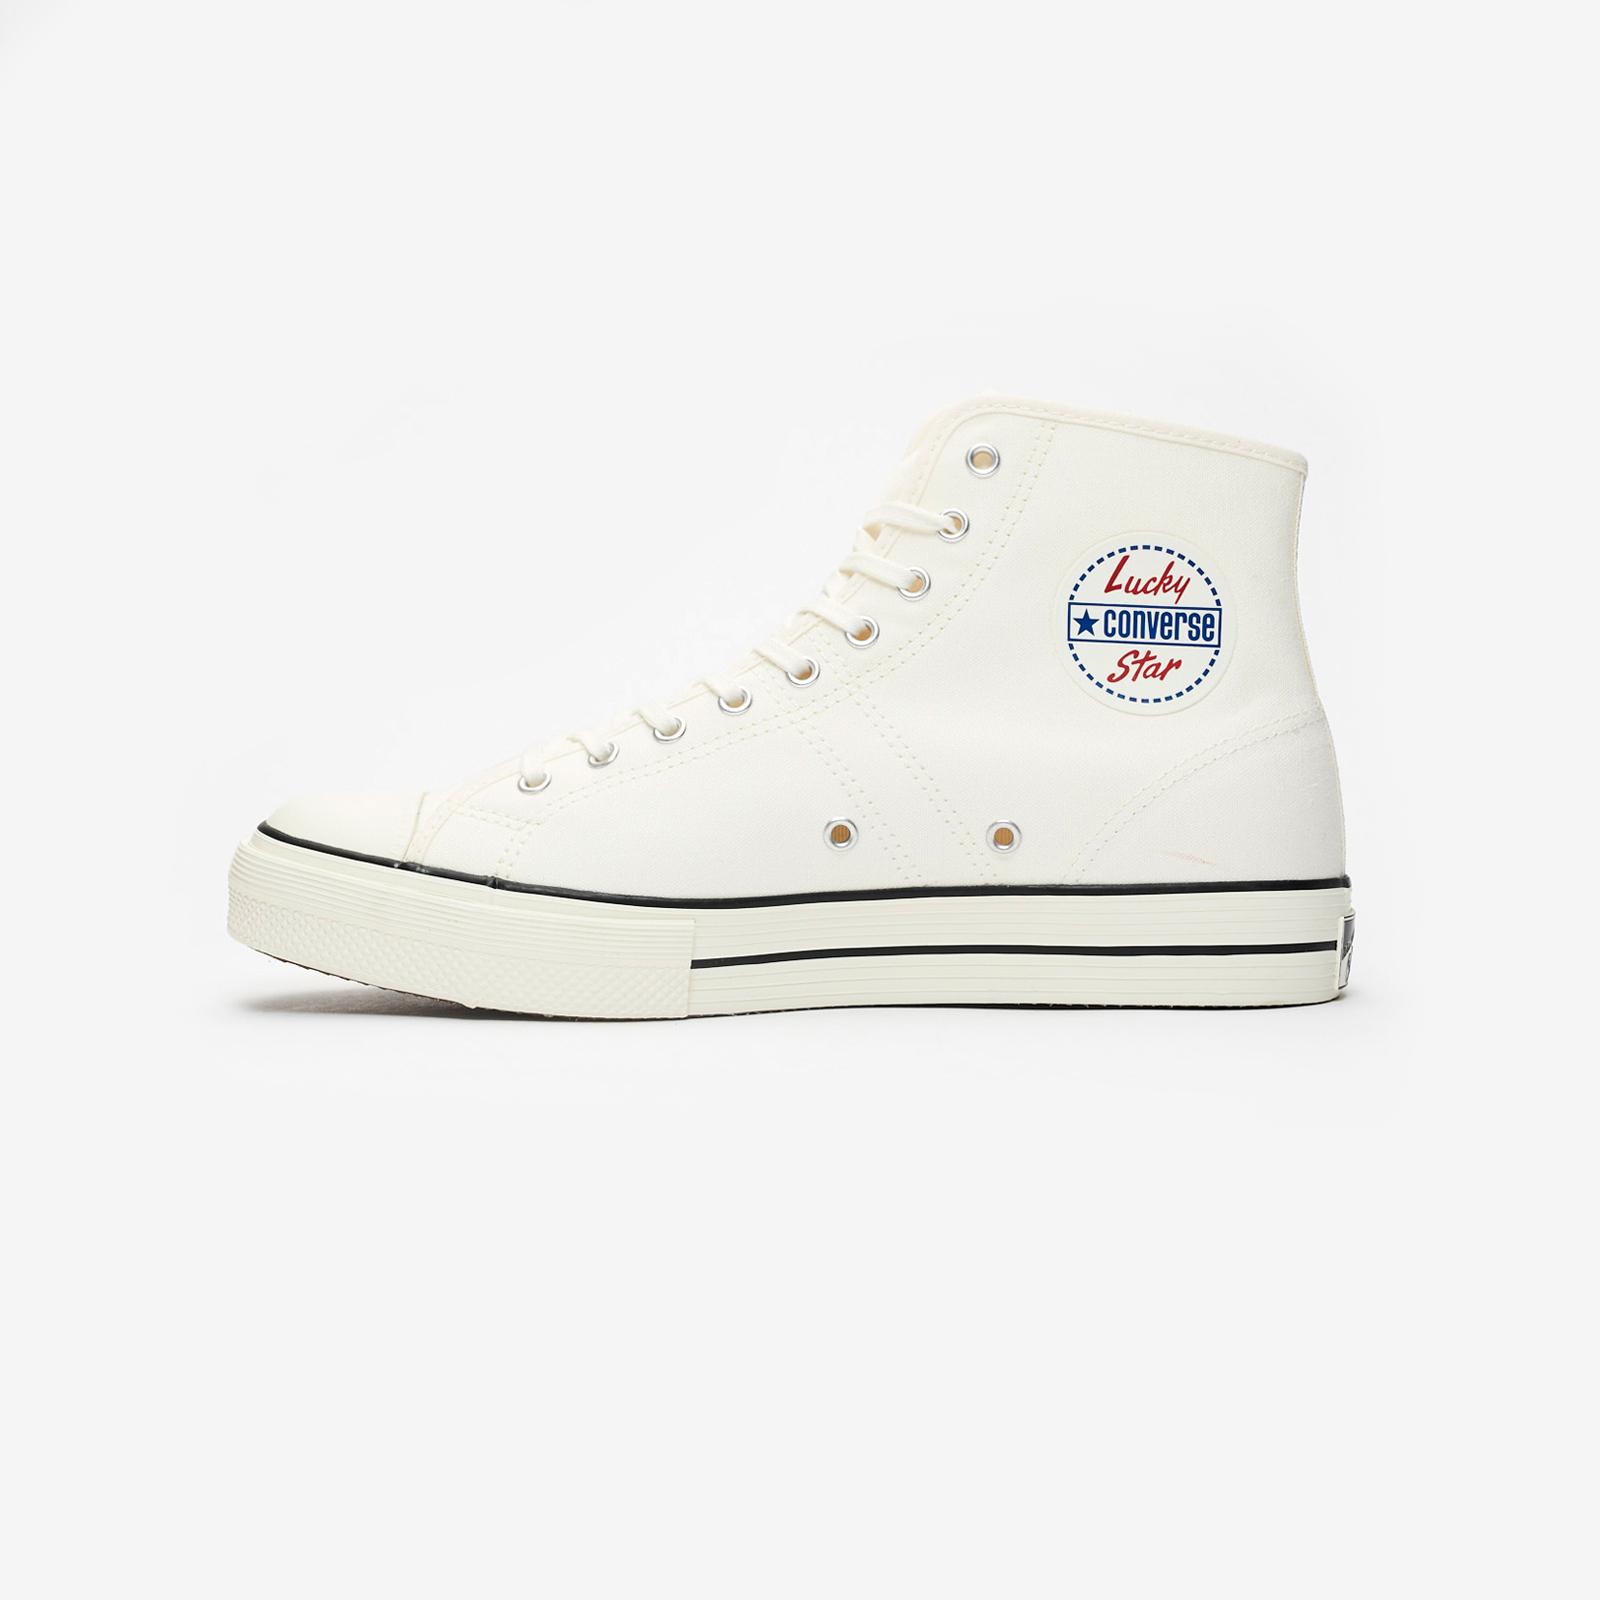 095141f30b9 Converse Lucky Star - 163158c - Sneakersnstuff